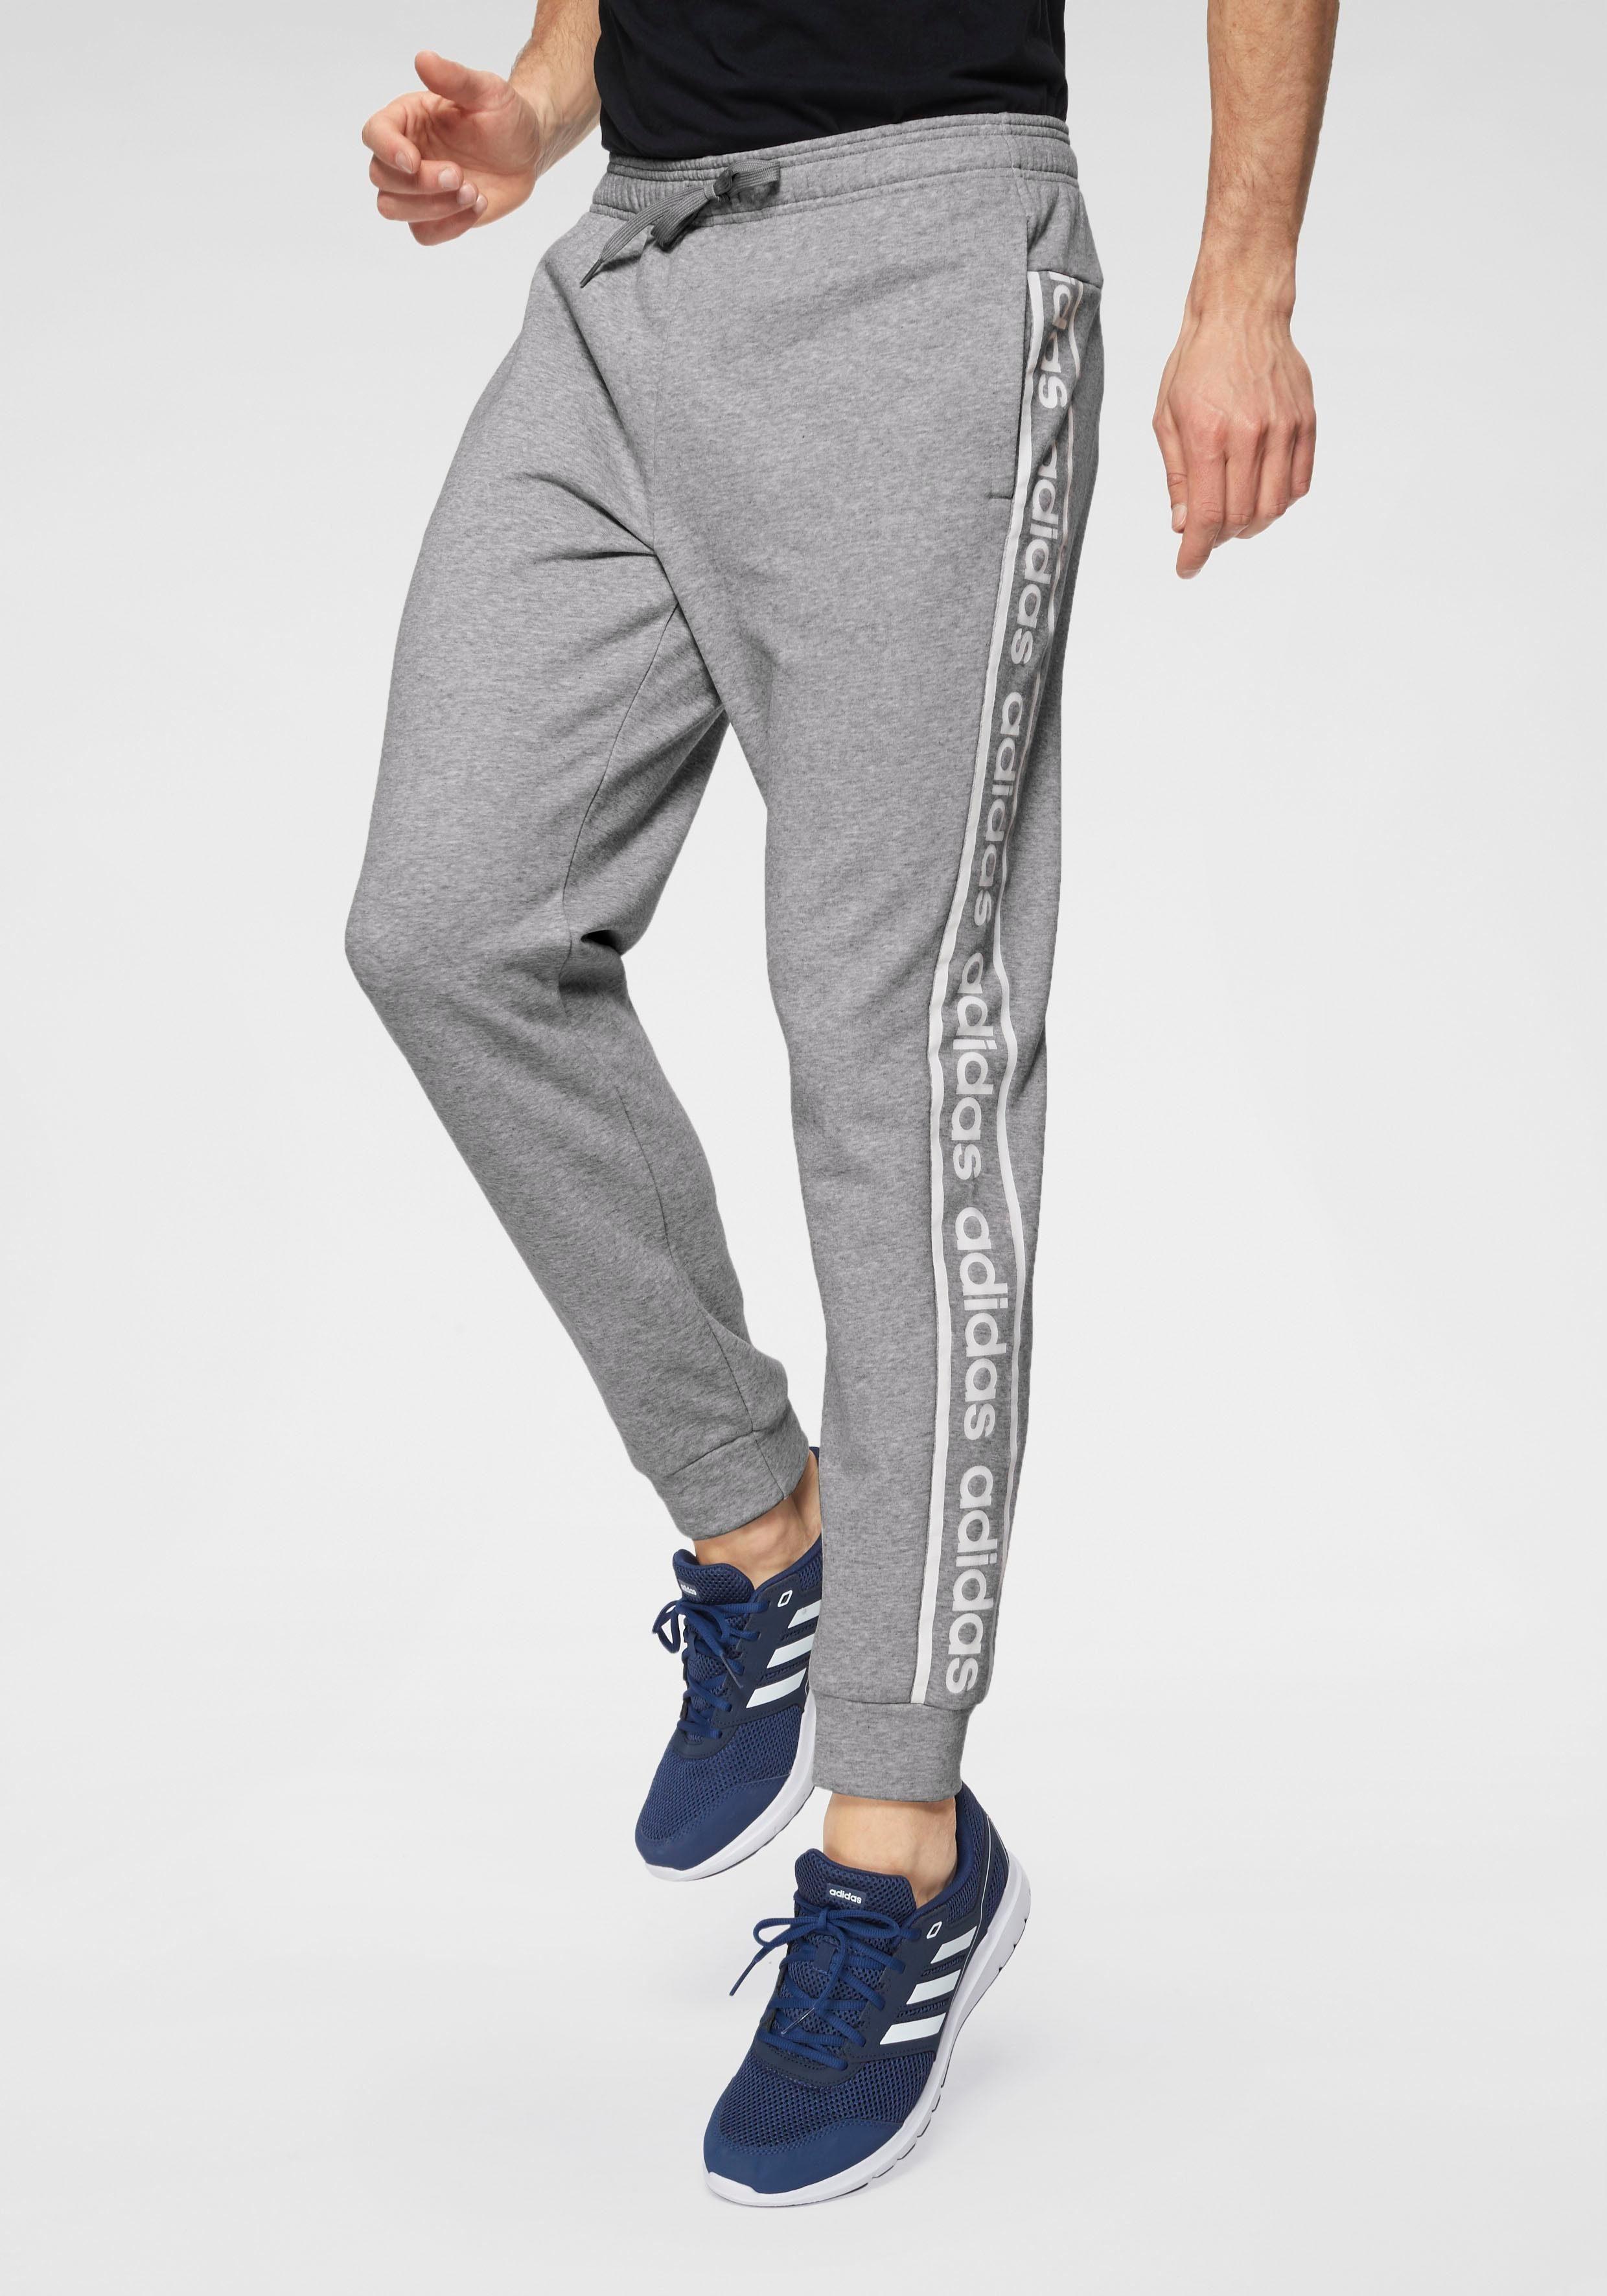 adidas Jogginghose »OSR C90 PANT«, Logodruck online kaufen | OTTO